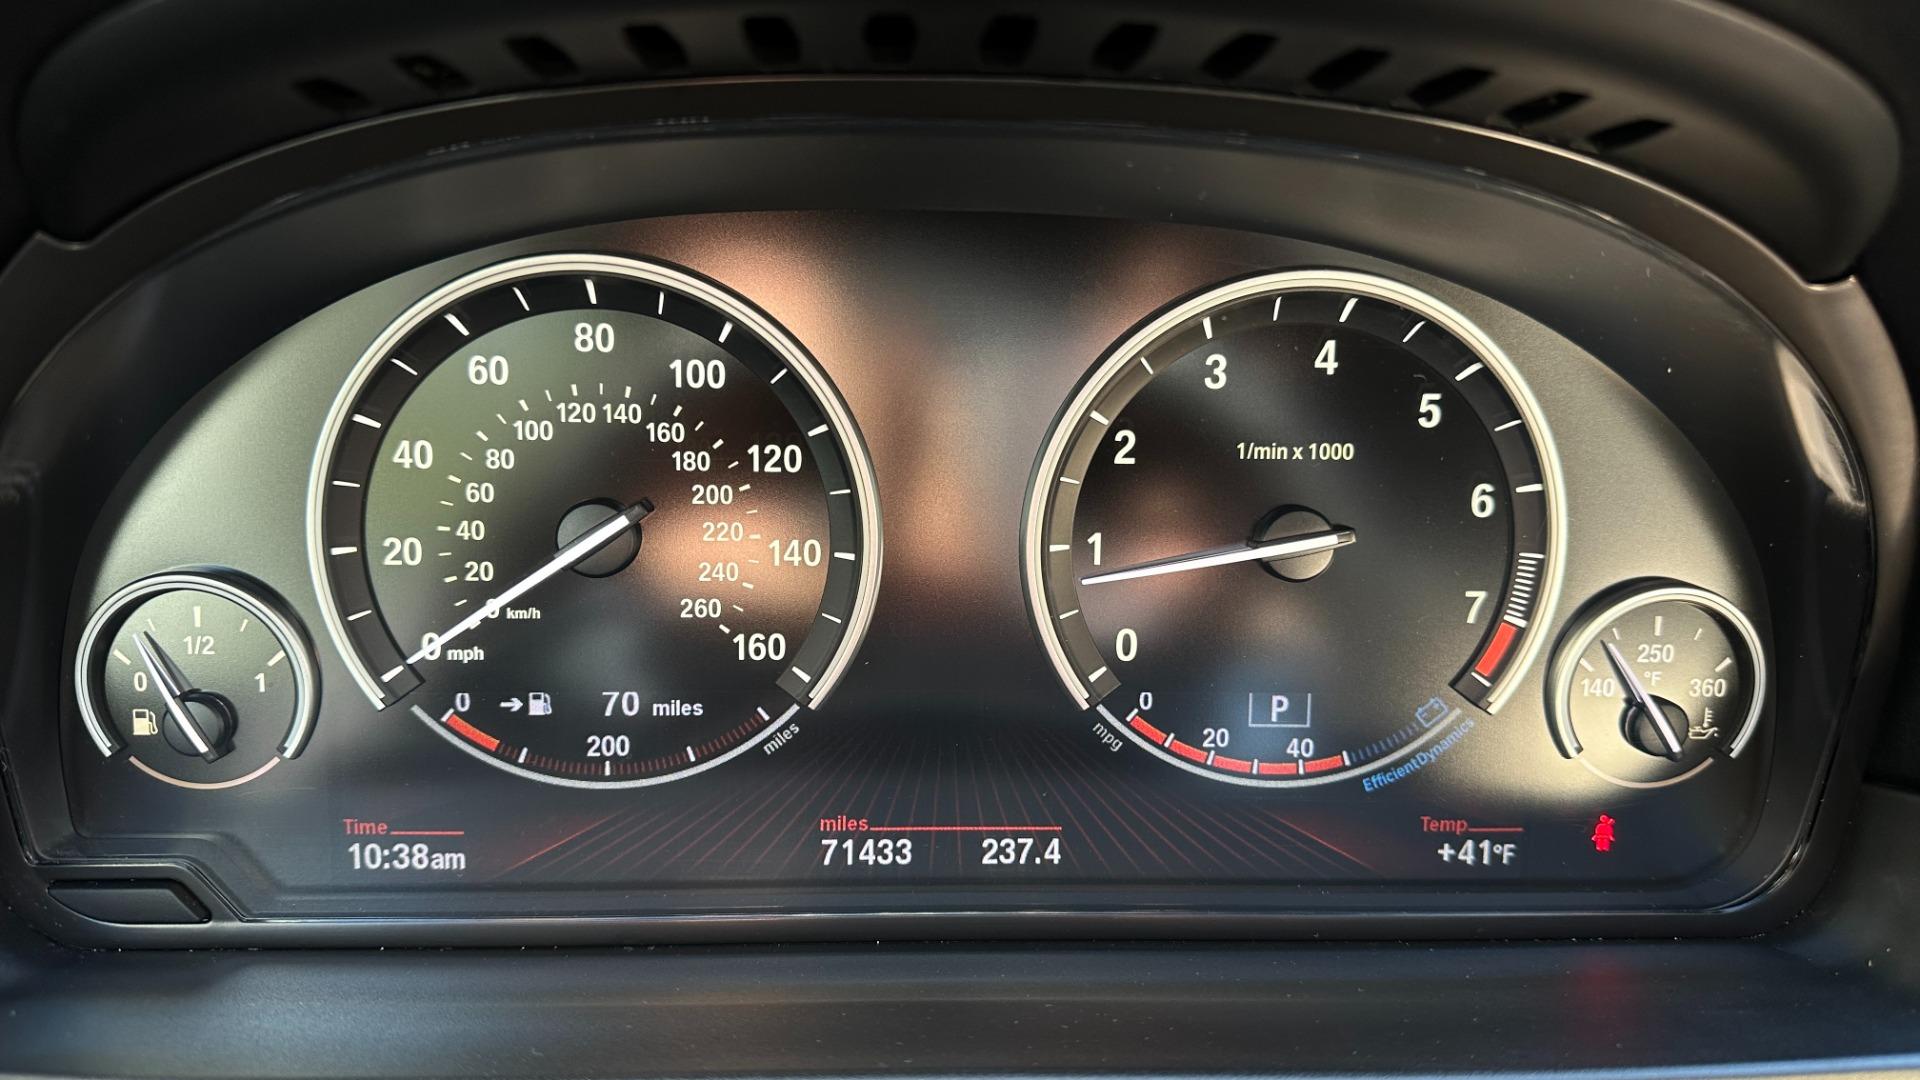 Used 2012 BMW 5 SERIES 550I M SPORT / NAV / CONV PKG / SUNROOF / PREM SND / REARVIEW for sale Sold at Formula Imports in Charlotte NC 28227 29